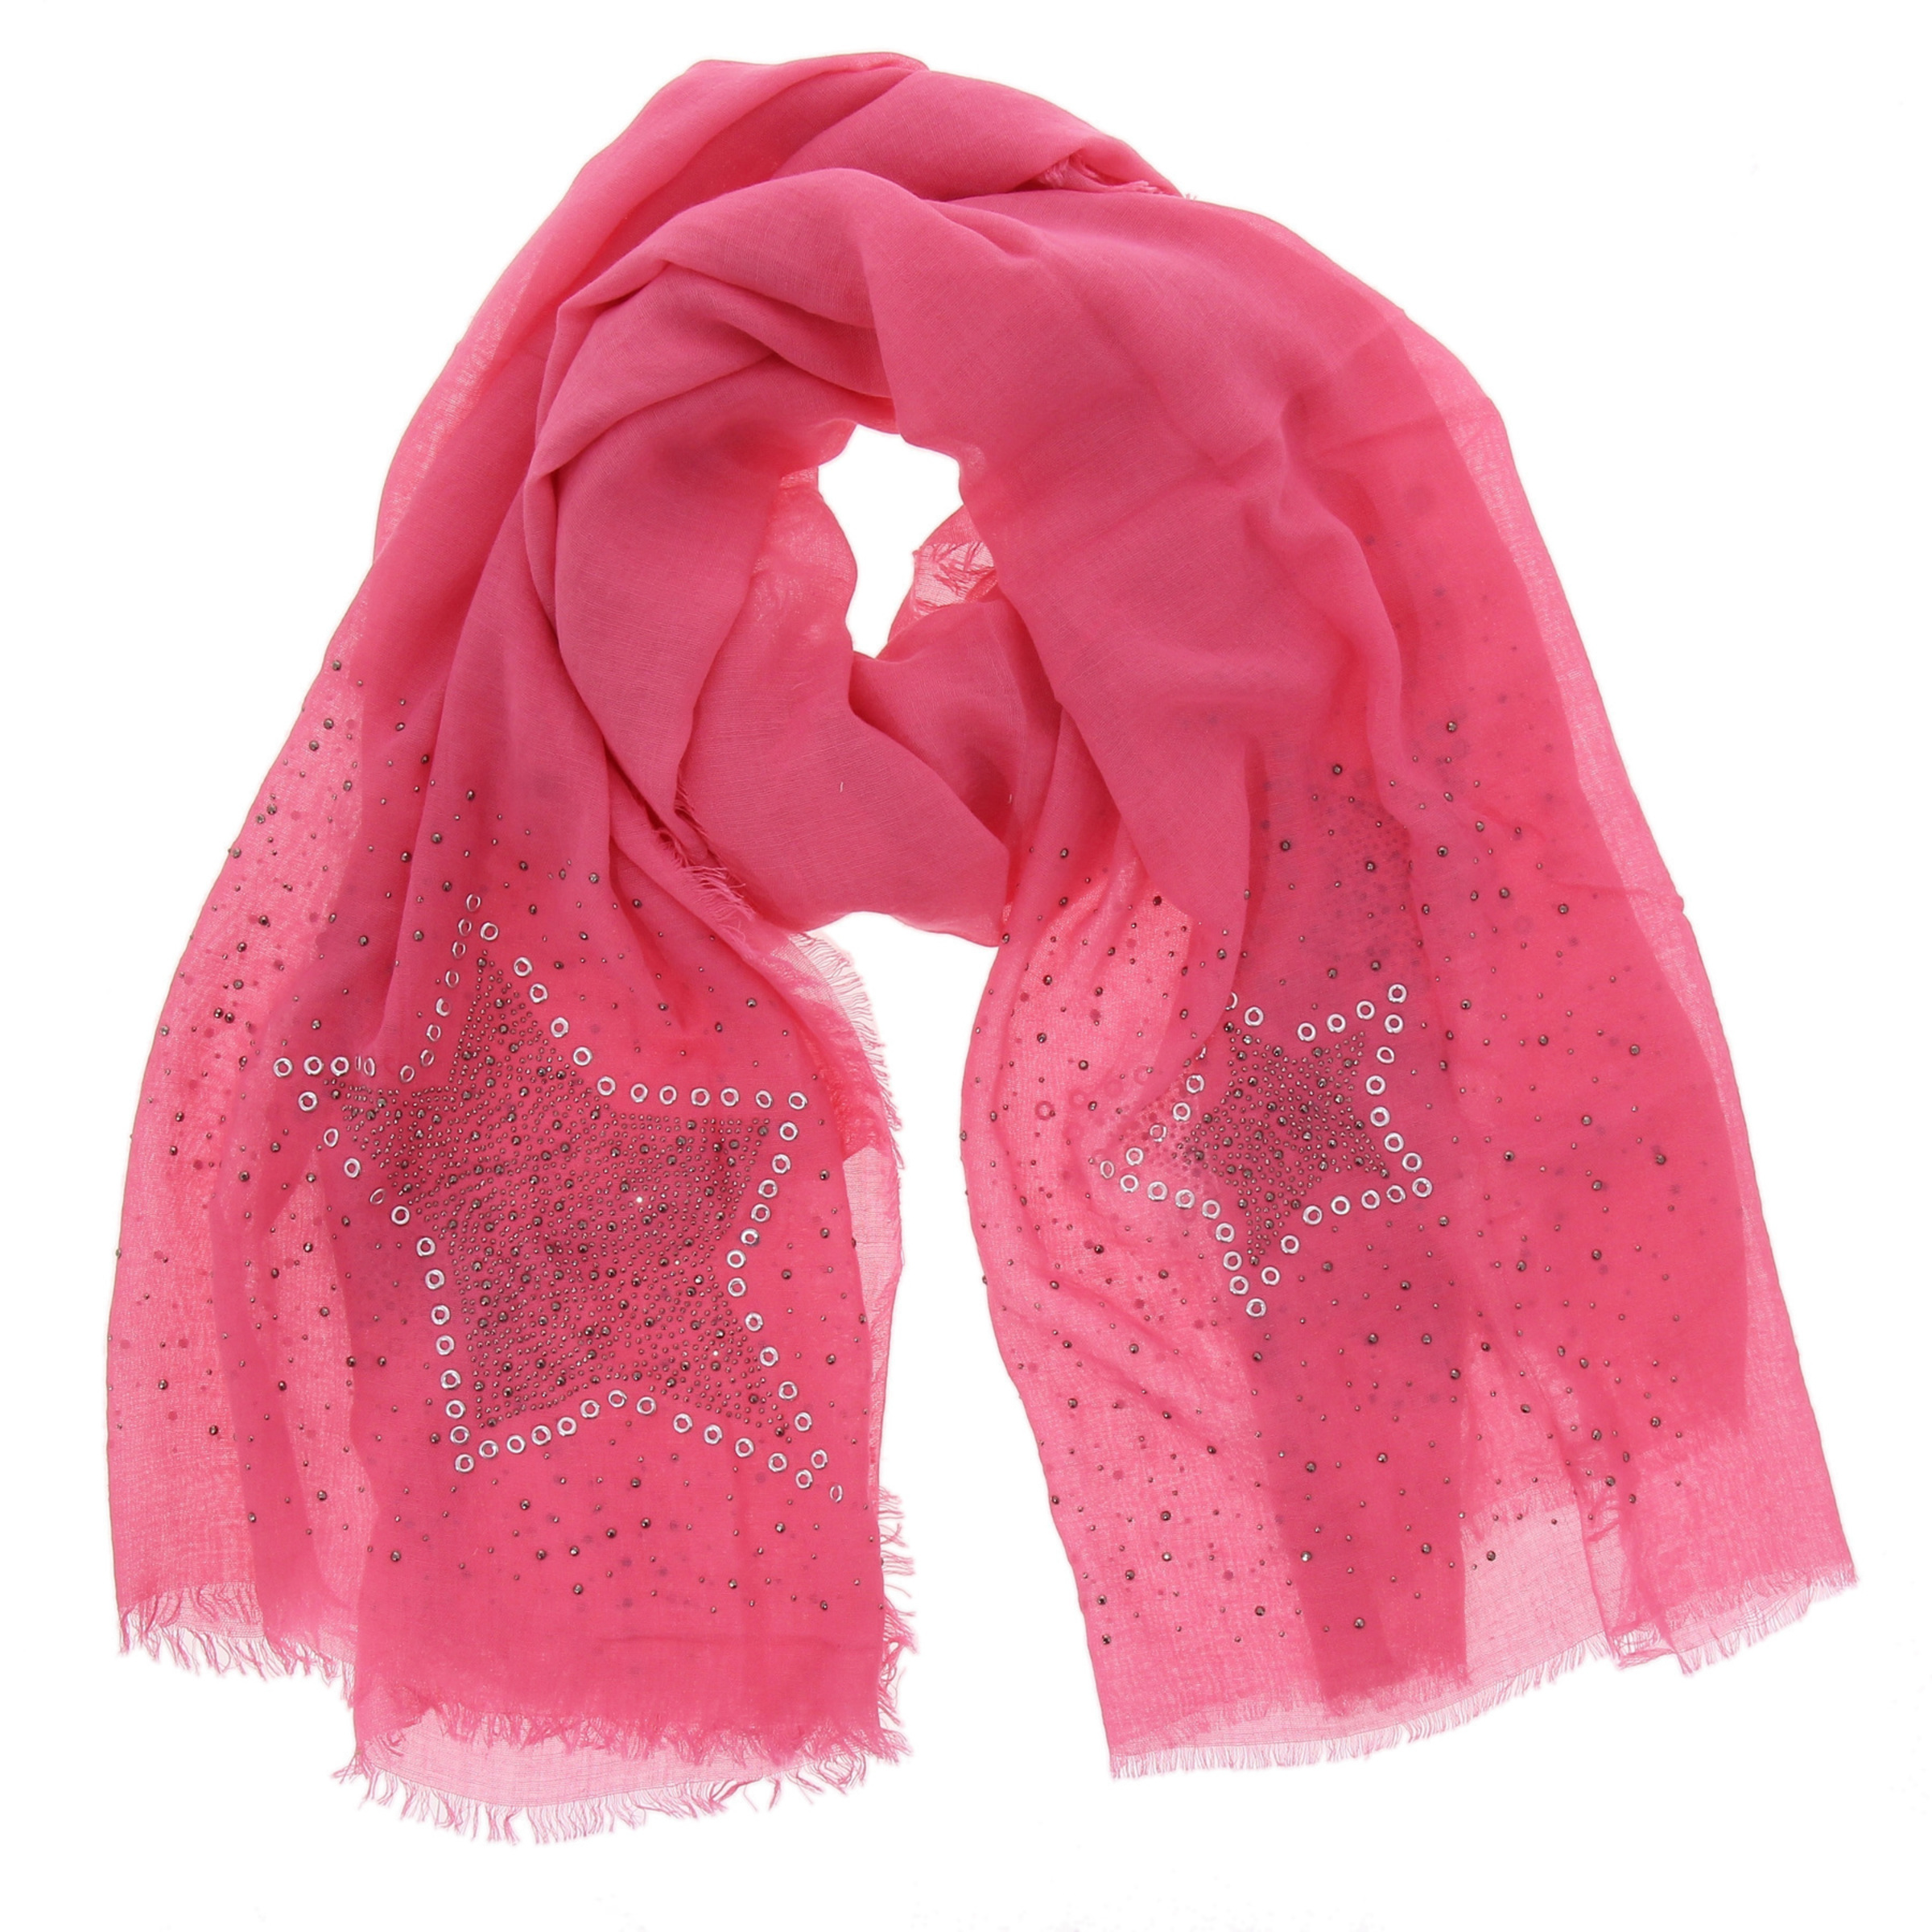 Echarpe femme toucher coton oversize étoile NUARA 2eb98ad9937